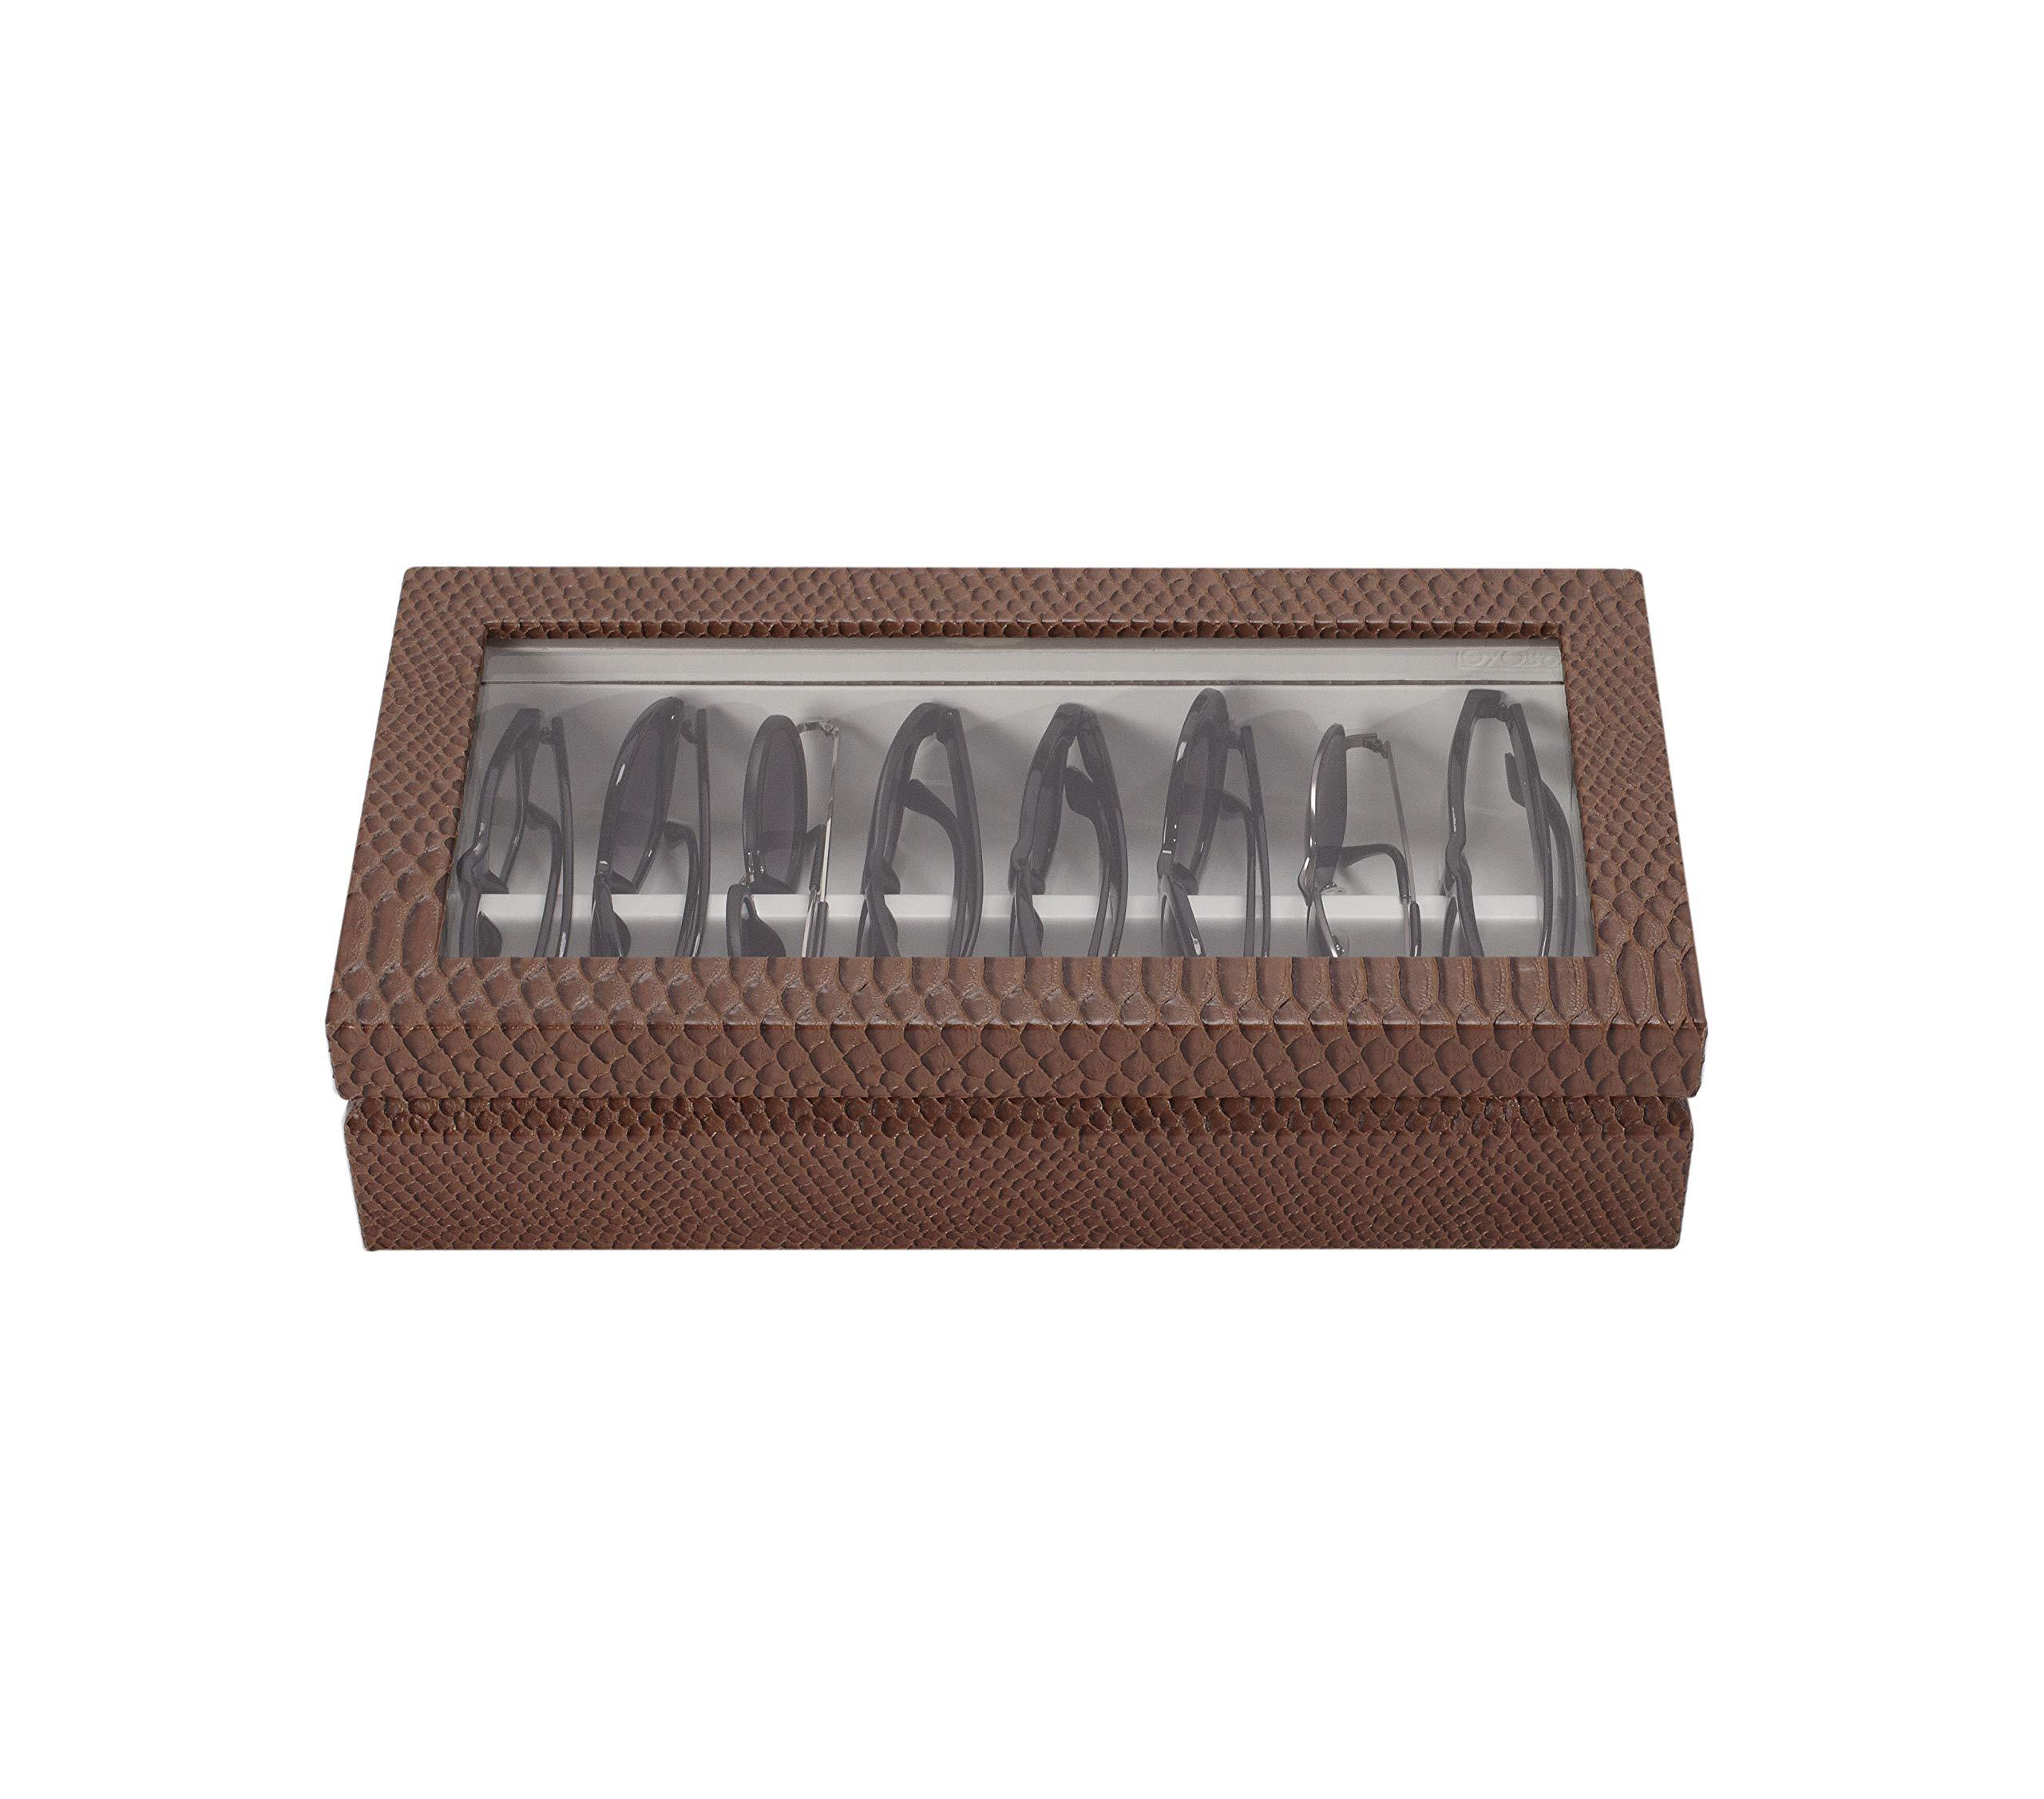 OYOBox Maxi Luxury Eyewear Organizer, Lacquered Wood Box for Glasses + Sunglasses (Chocolate Croc)